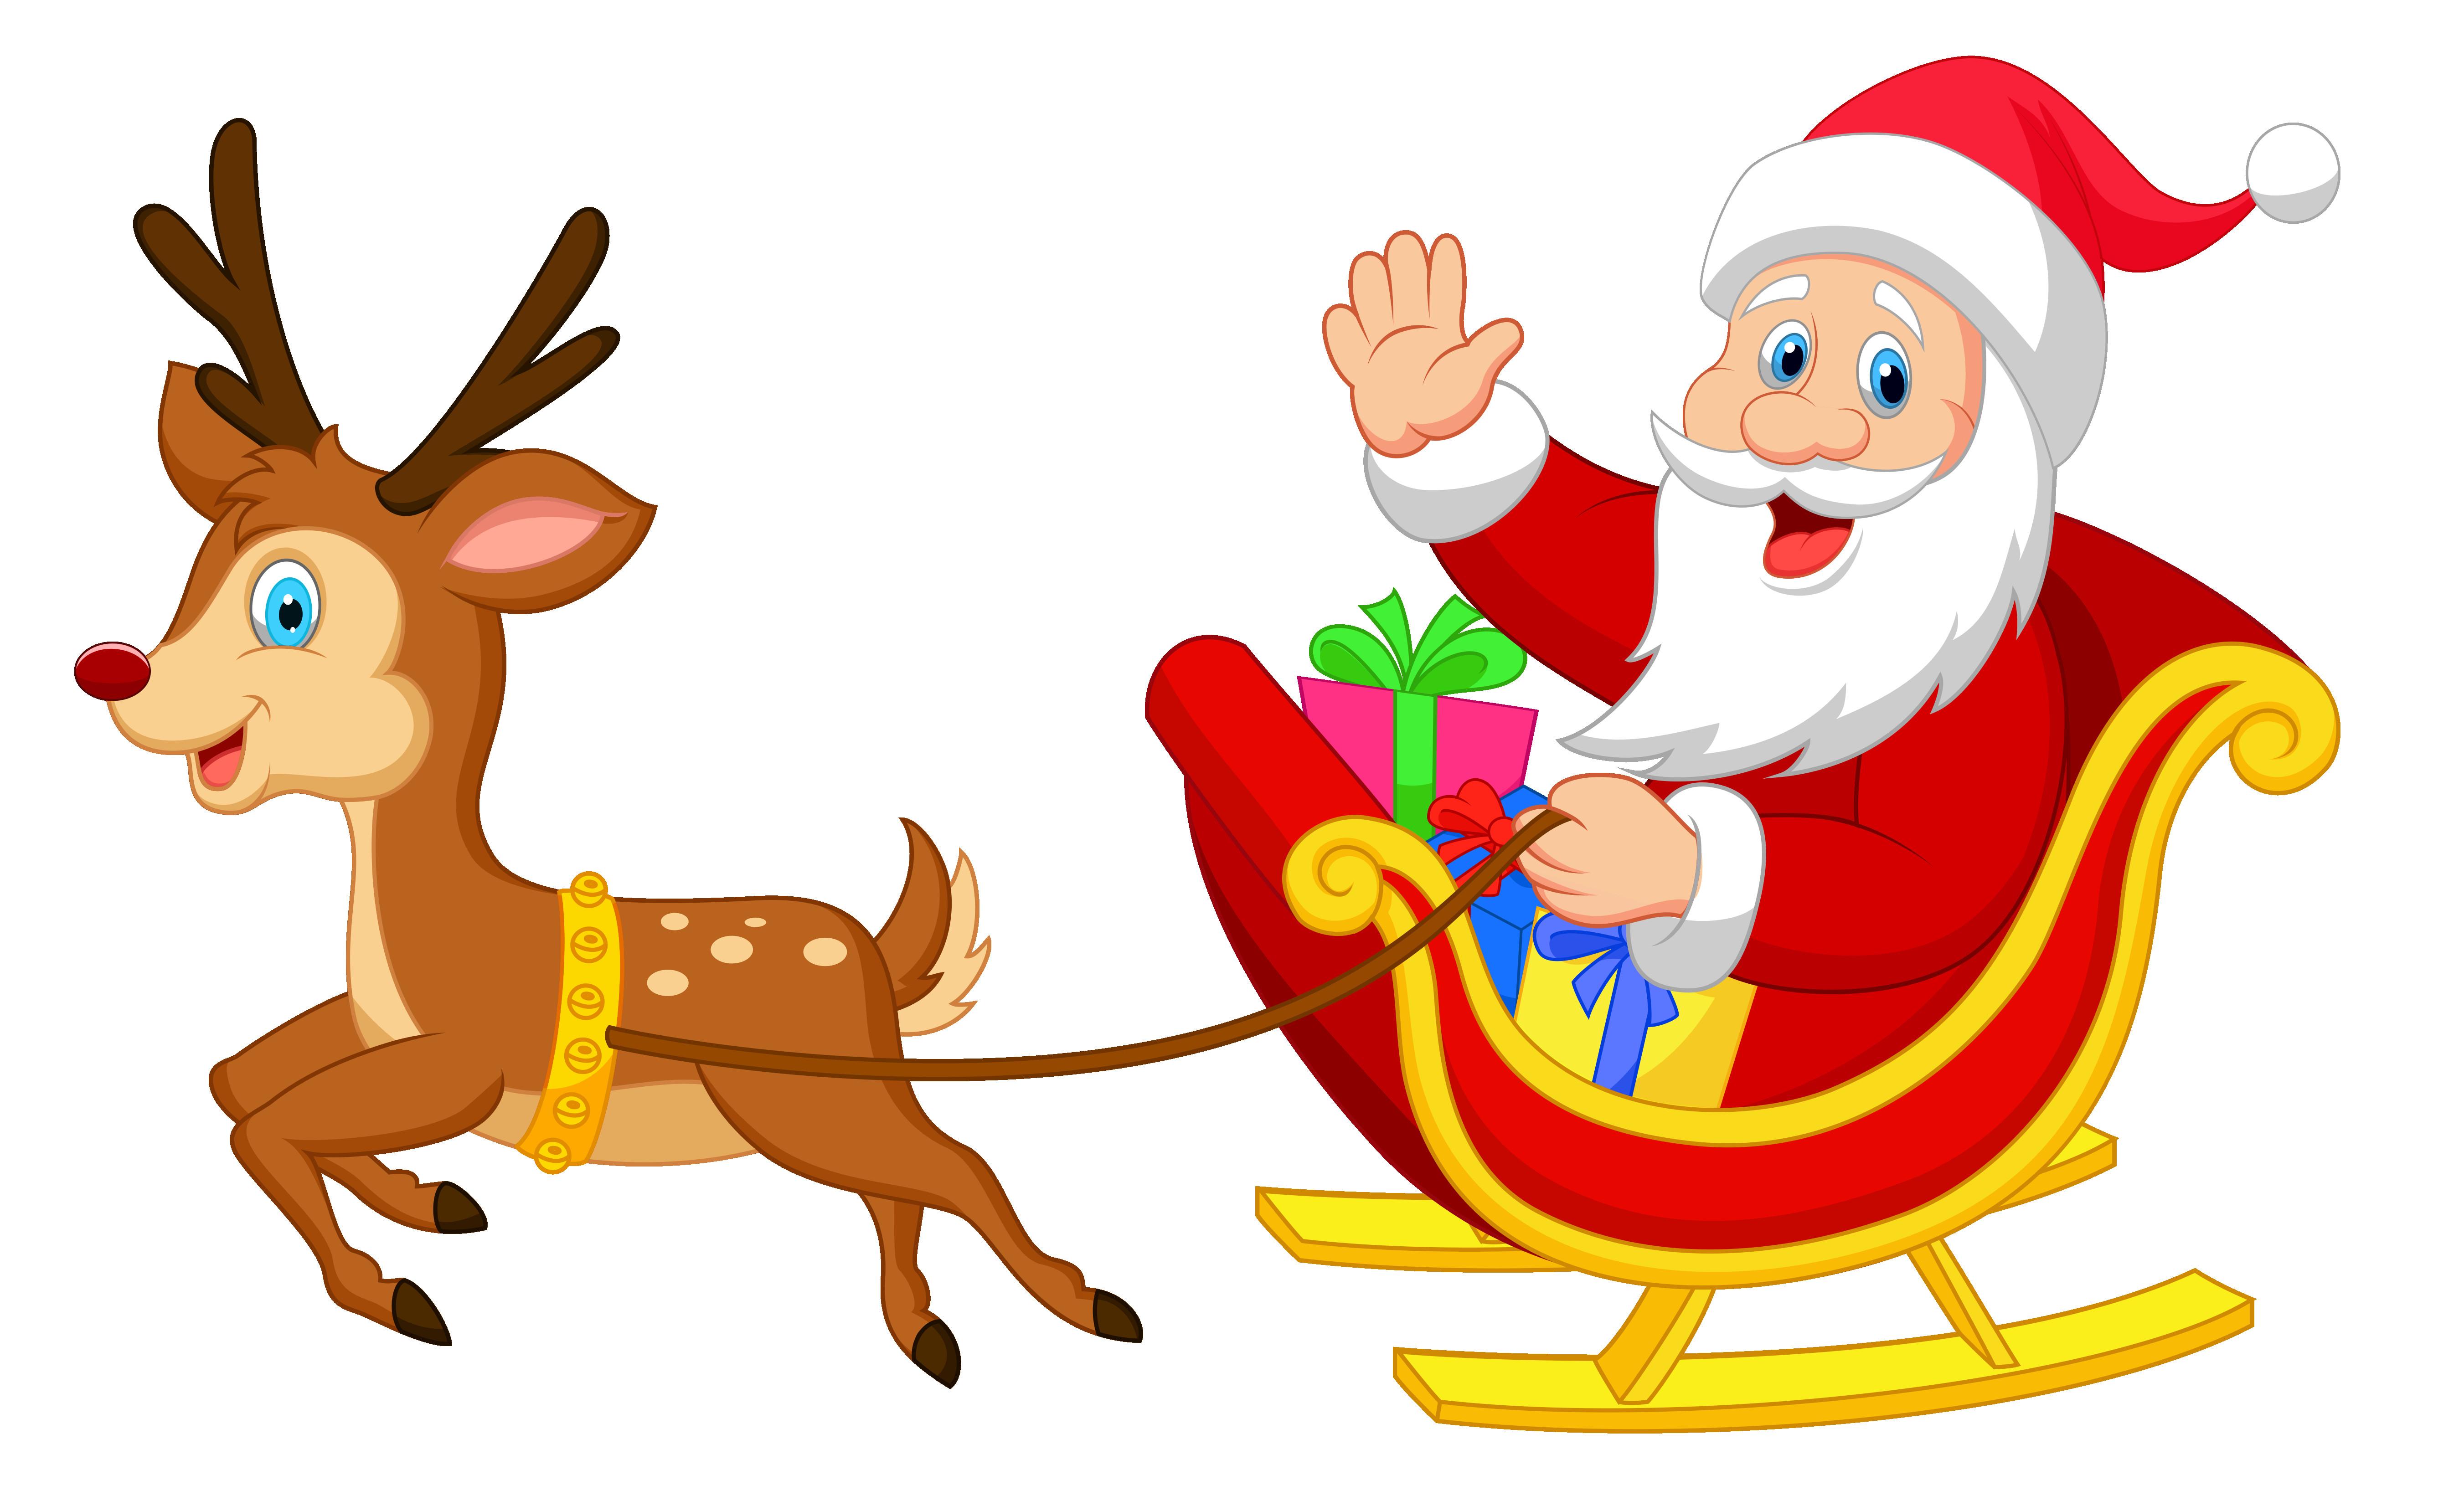 santa sleigh clipart at getdrawings com free for personal use rh getdrawings com santa and his sleigh clipart santas sleigh clipart